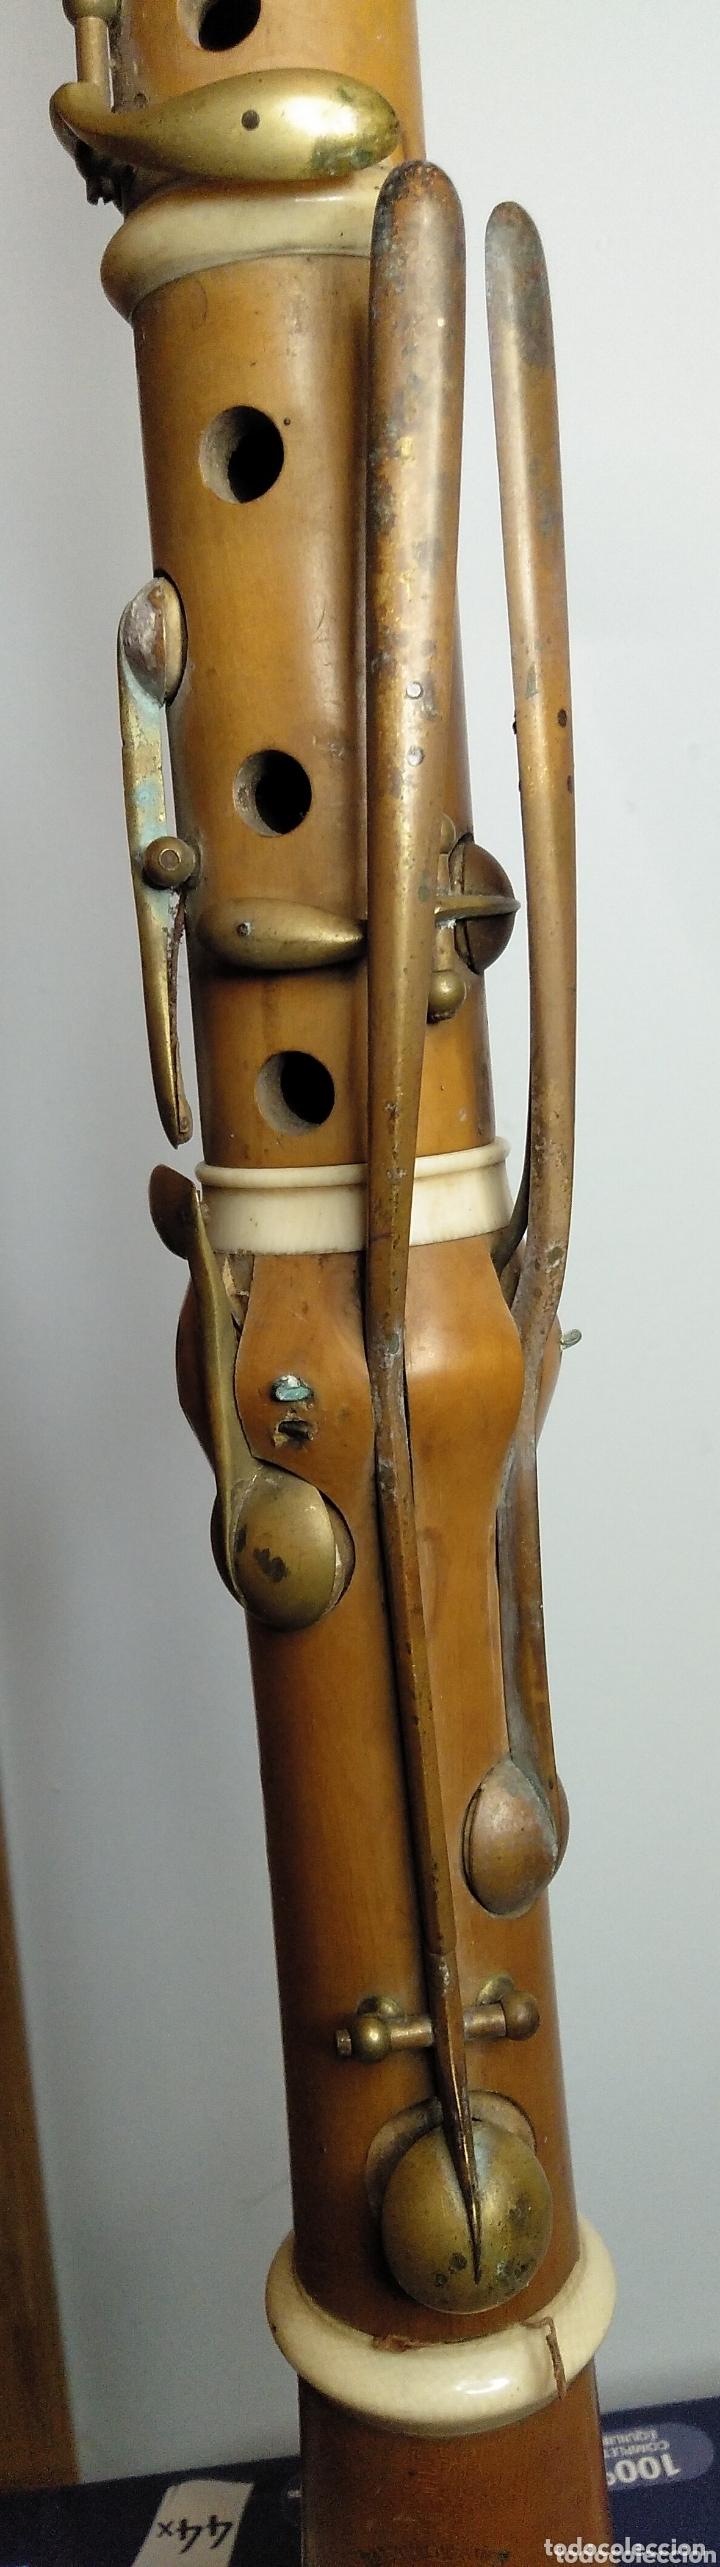 Instrumentos musicales: Clarinete Gautrot boj y marfil - Foto 6 - 172658045